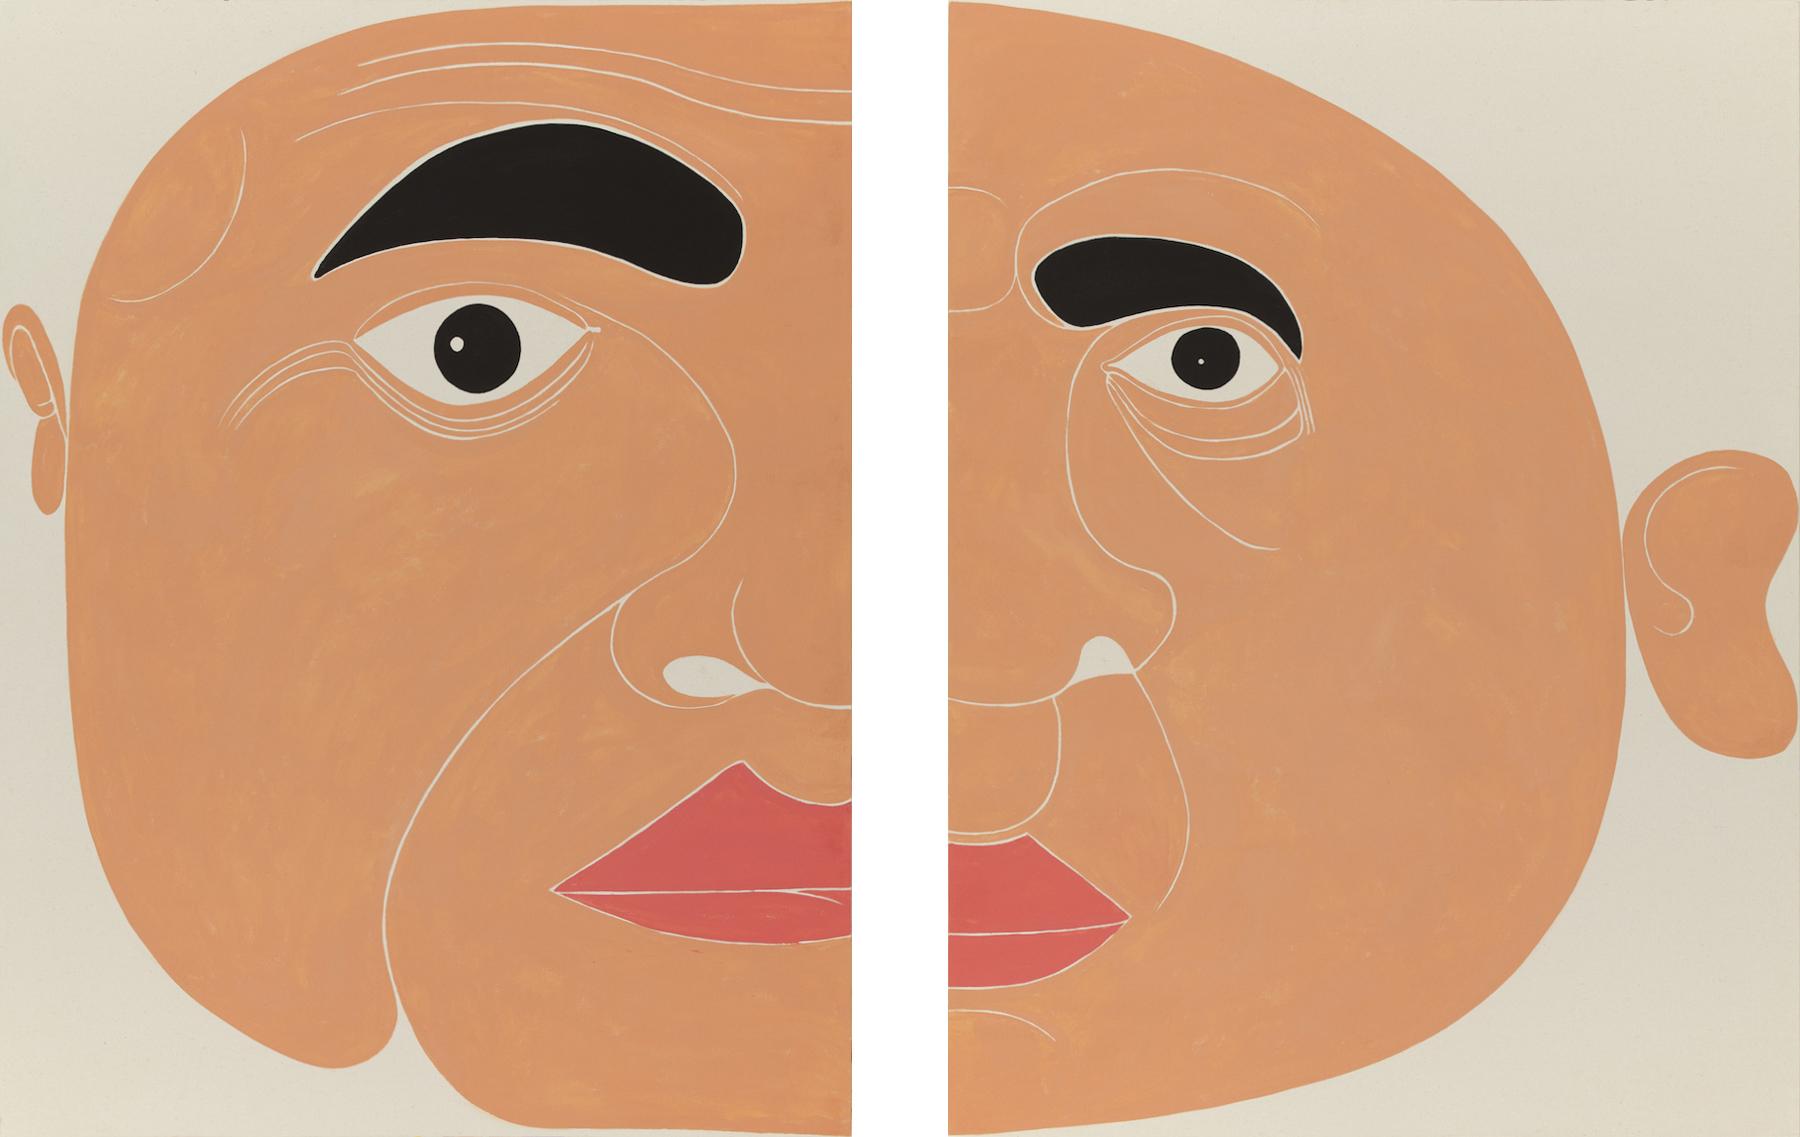 Giovanni Garcia-Fenech -  Self-Portrait, 2012